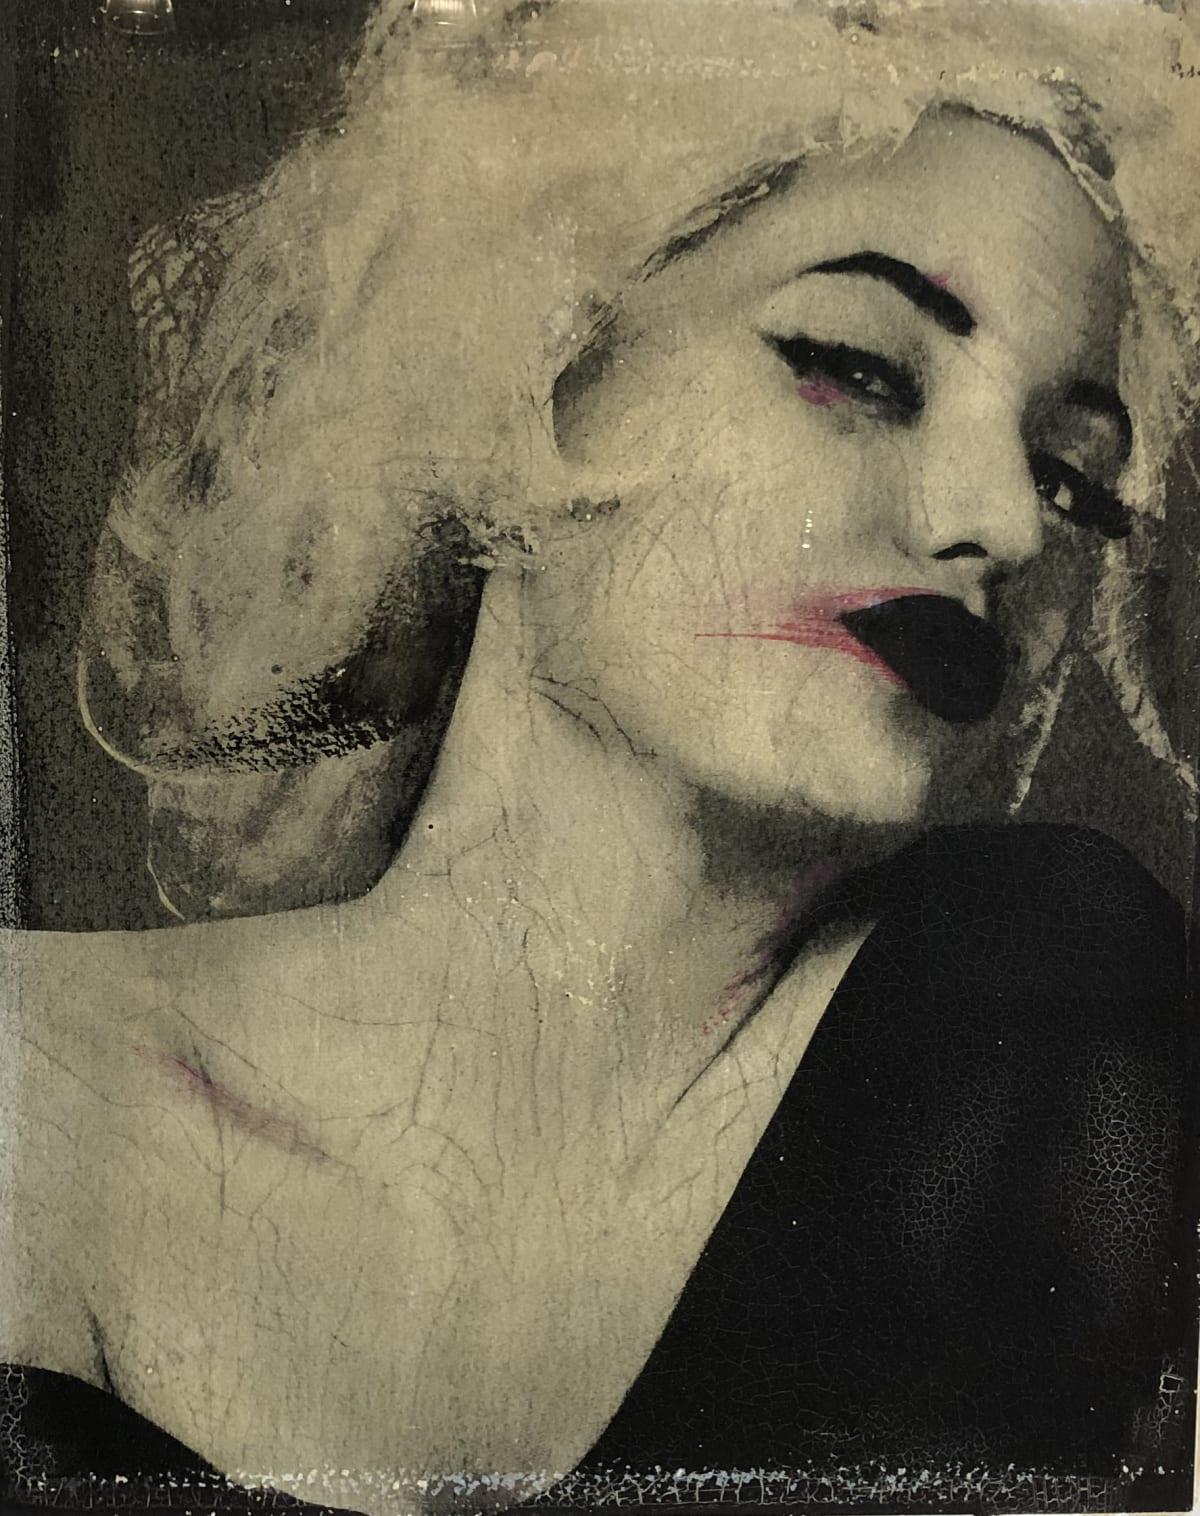 Lita Cabellut, Marilyn Monroe - II, 2012